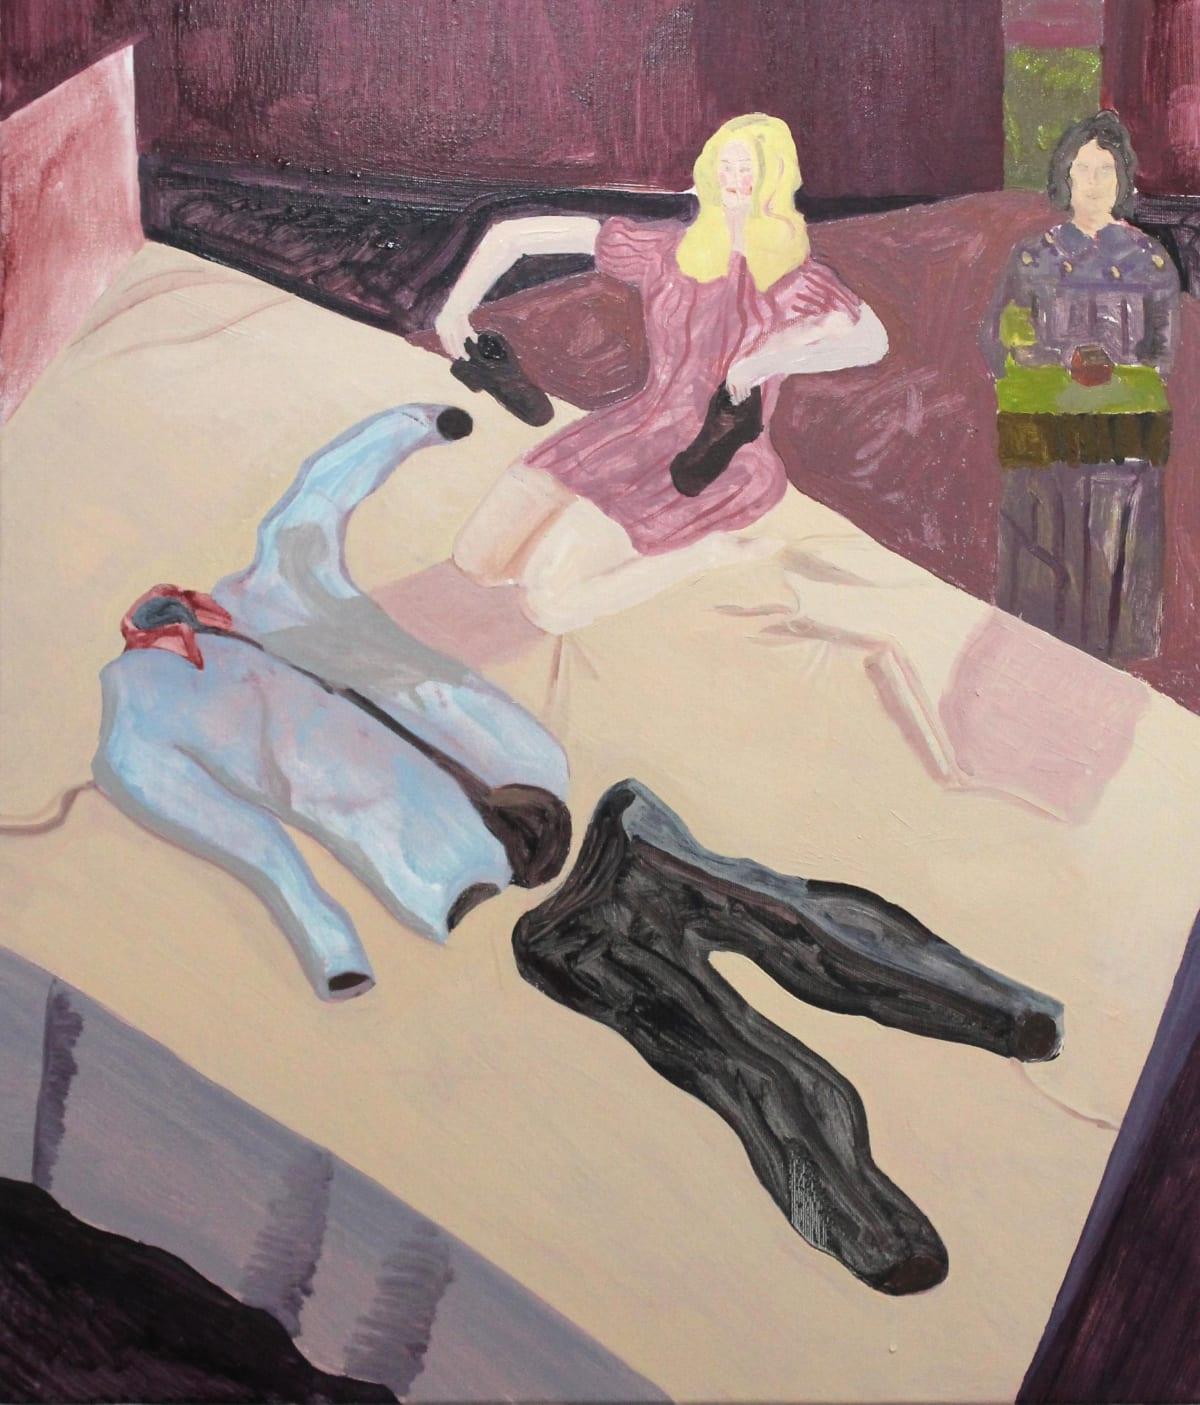 Oscar Fouz Lopez Scape Oil on canvas 70 x 60 cm